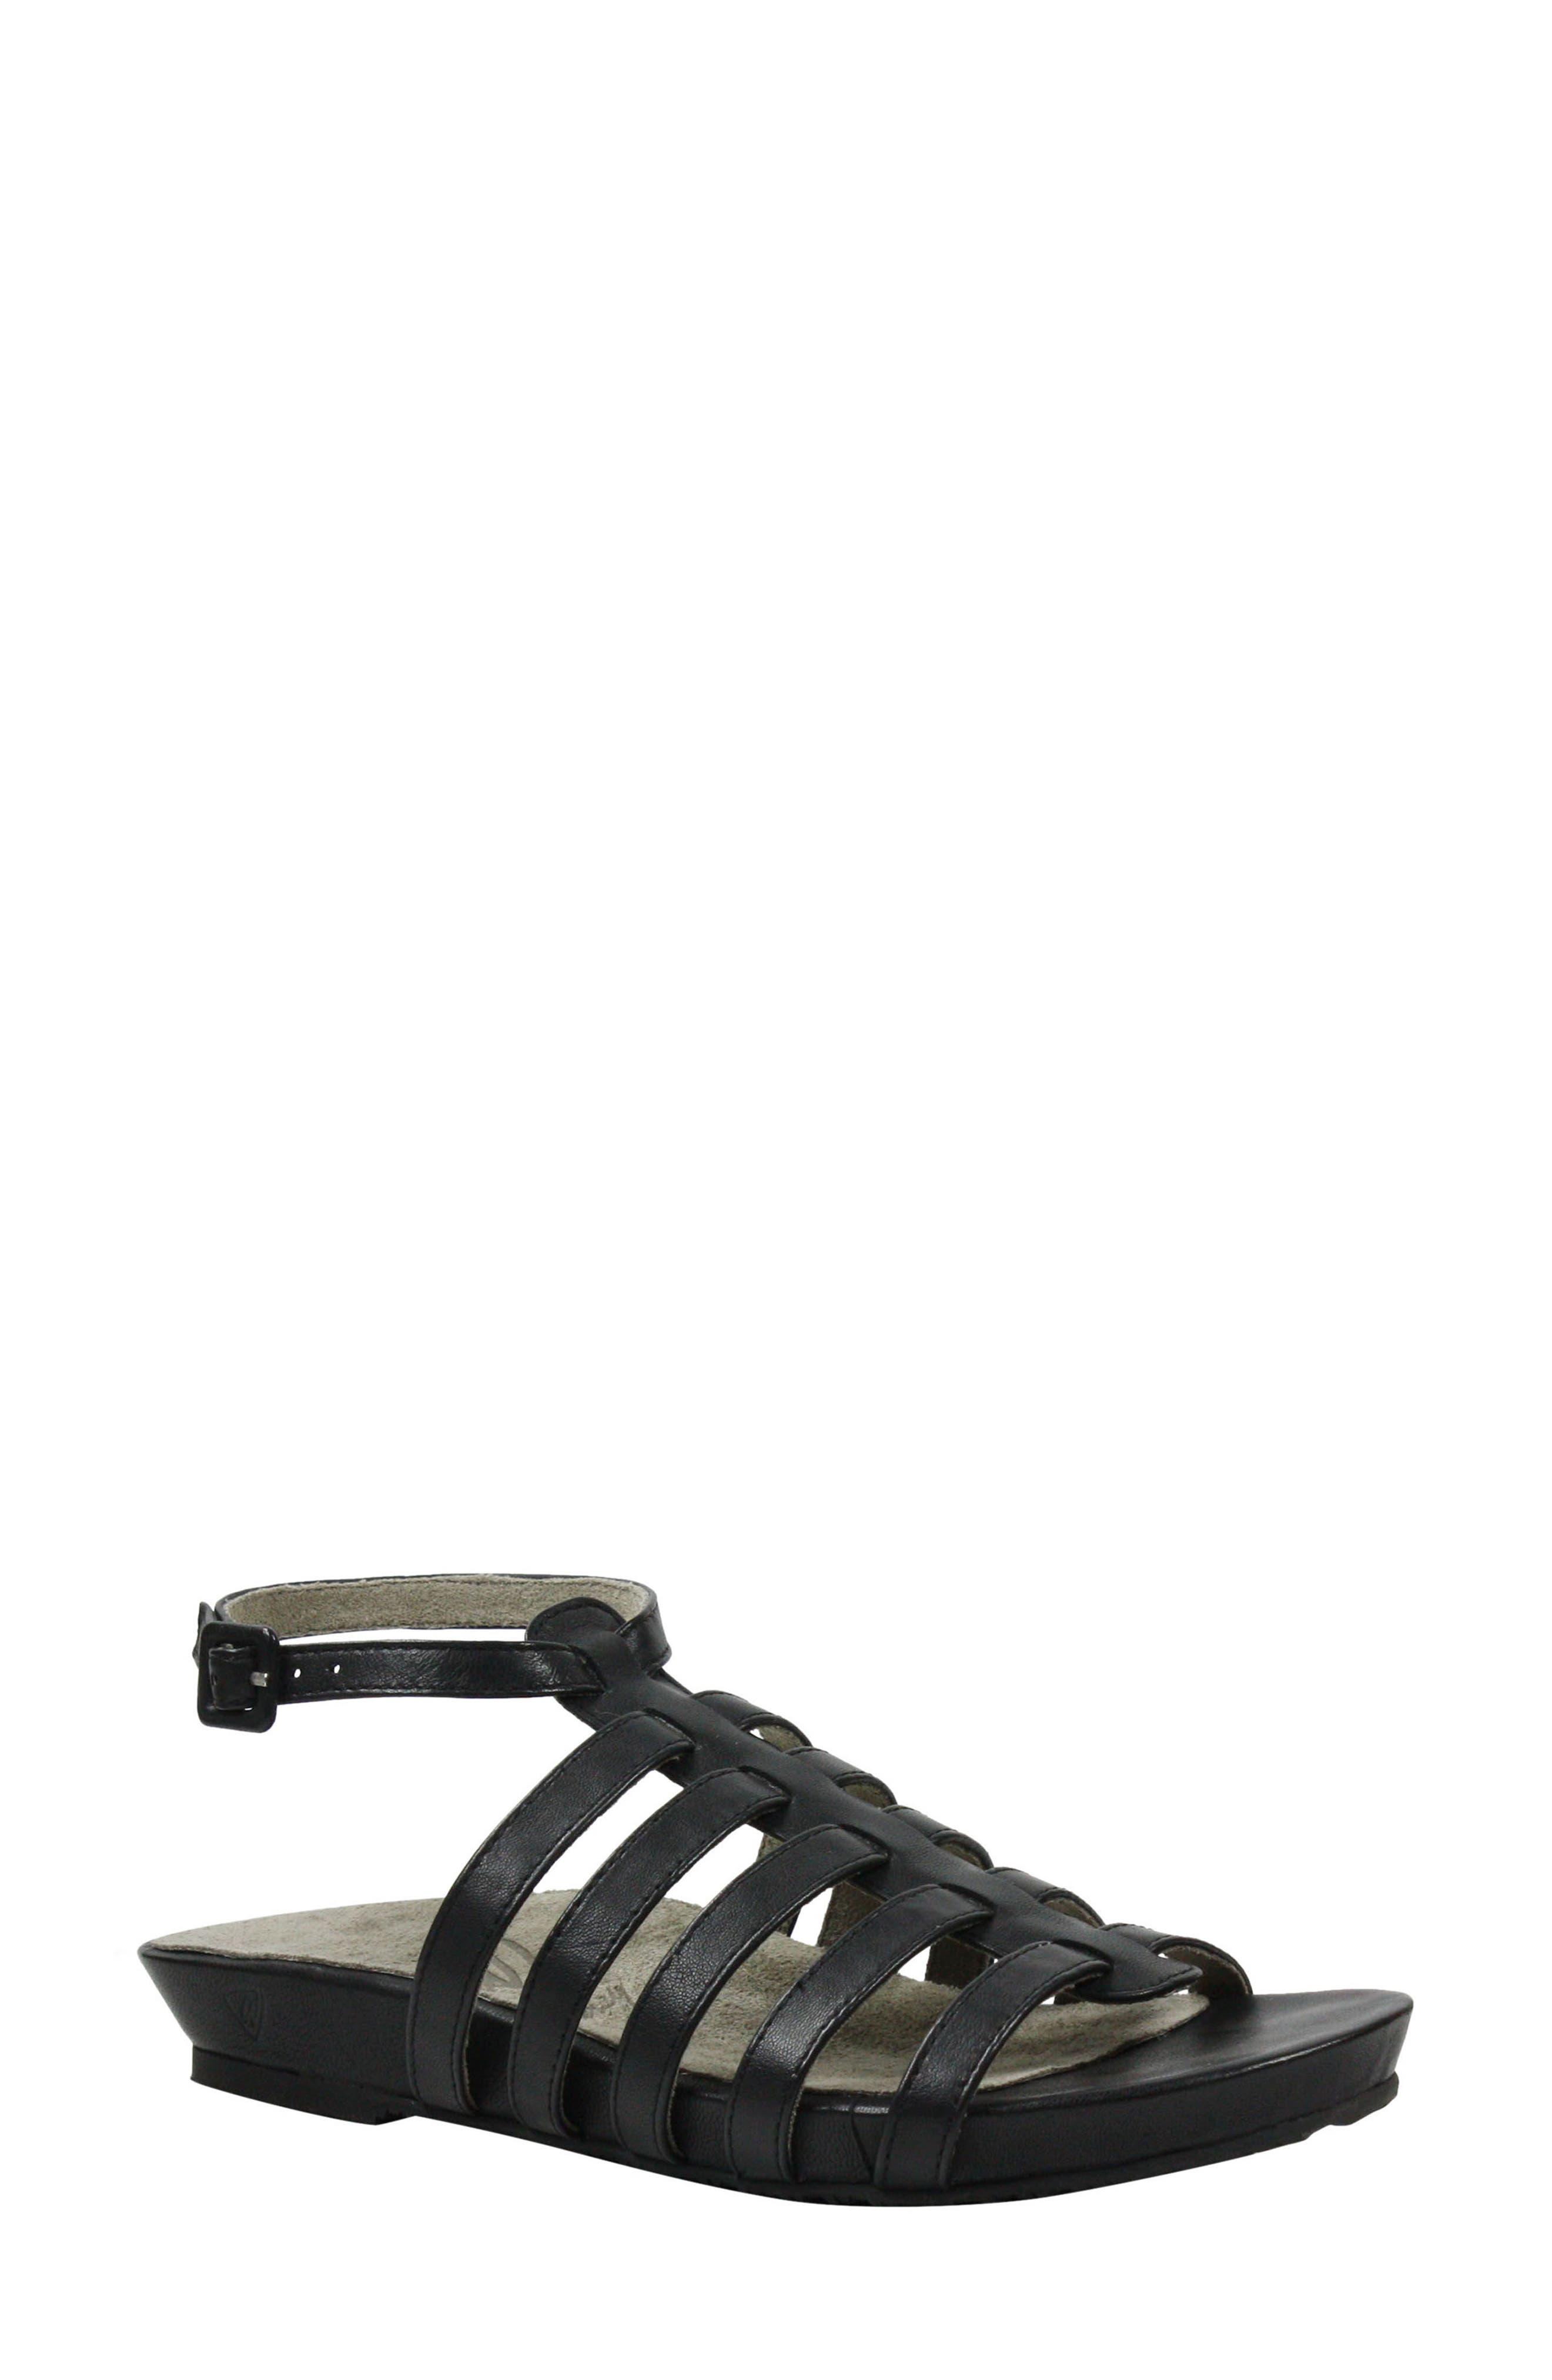 Delmor Ankle Strap Sandal,                             Main thumbnail 1, color,                             BLACK LEATHER